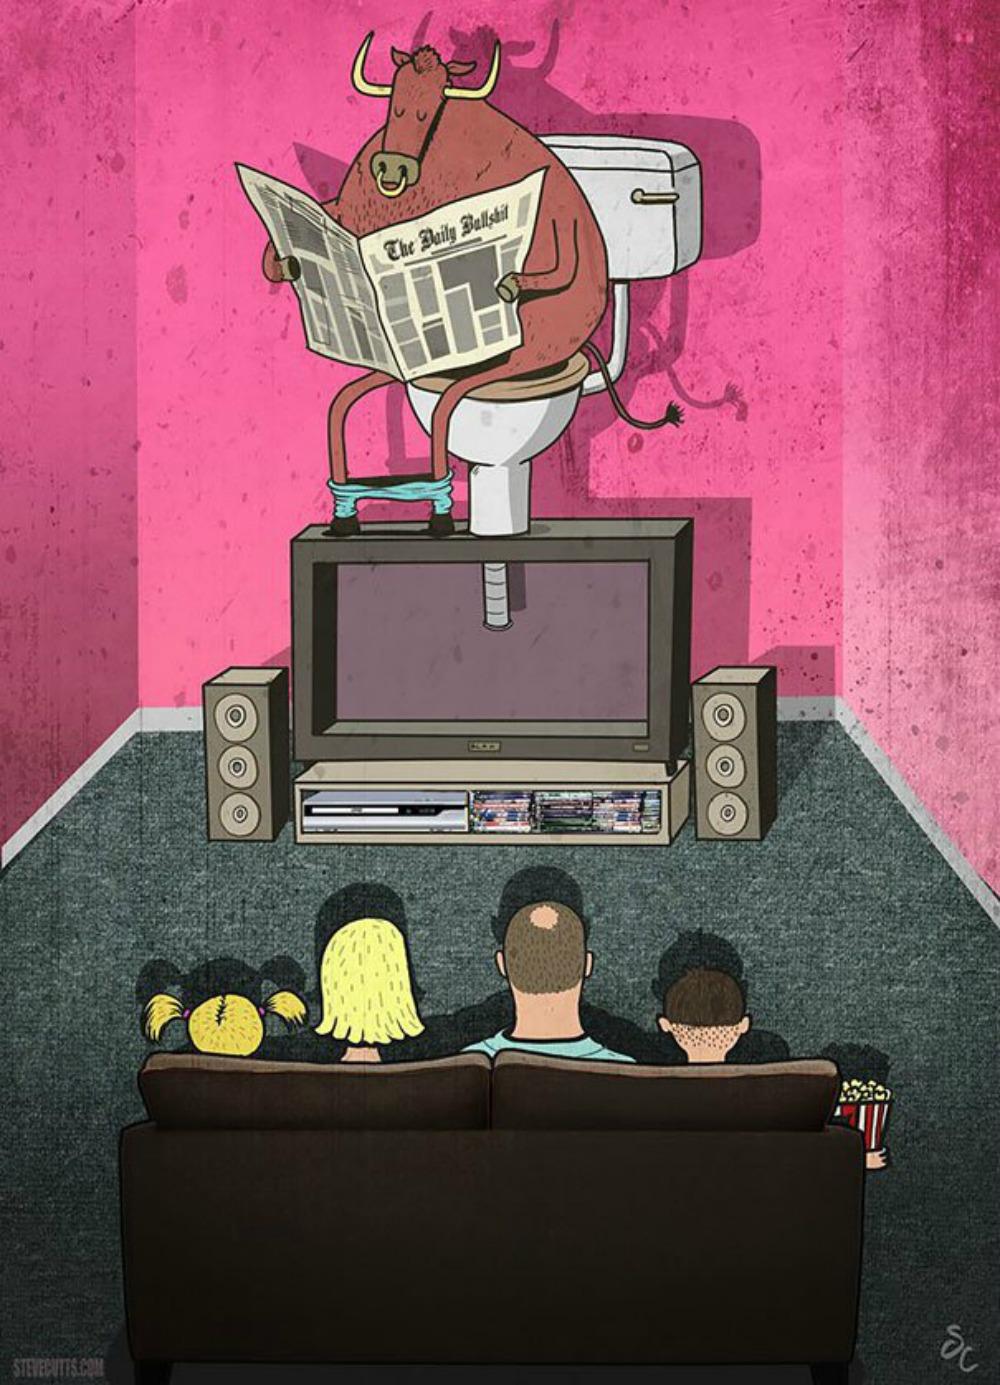 Satirical_Illustrations_Addiction_to_Technology20